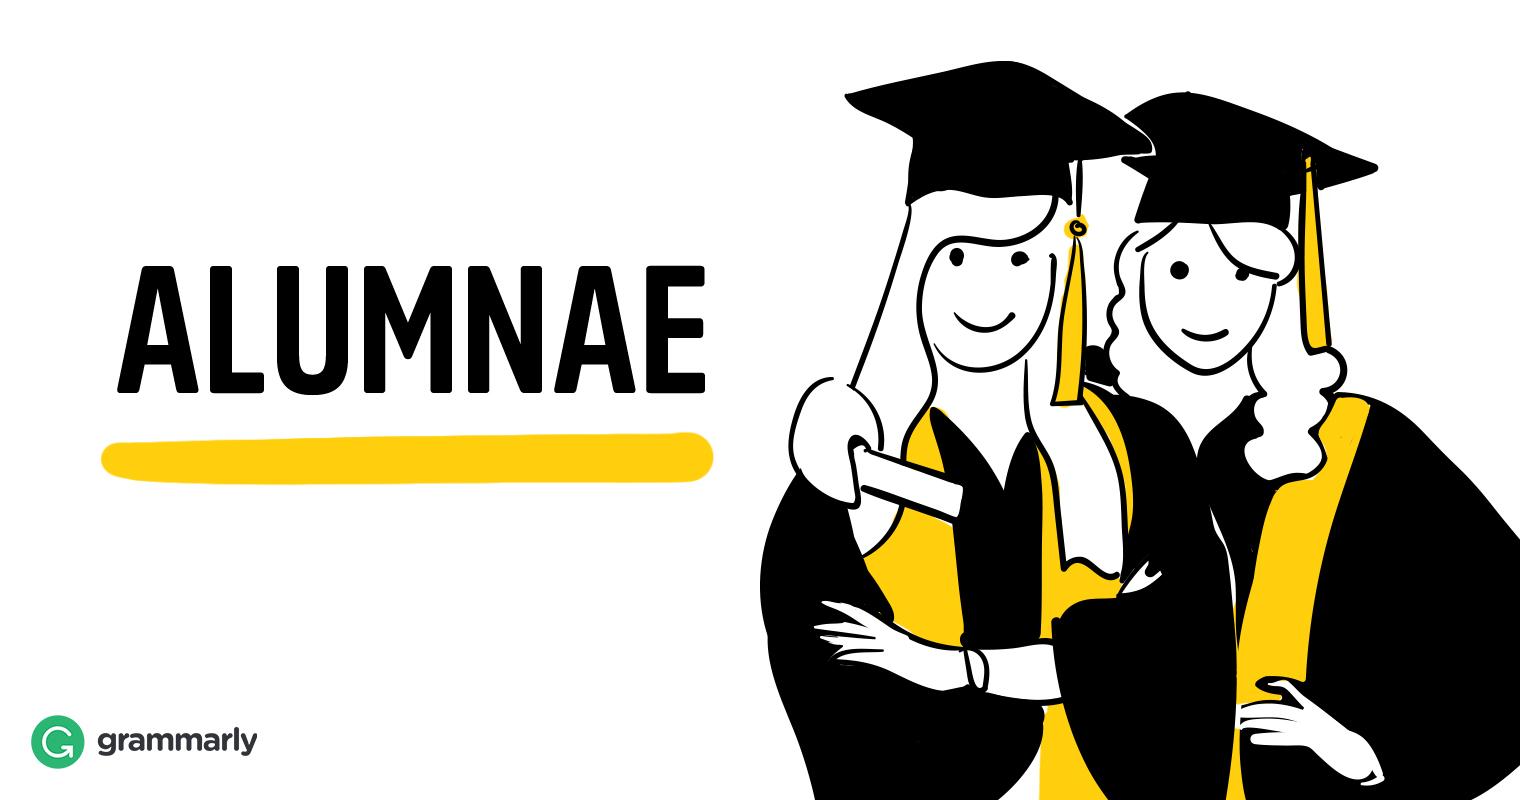 Alumnae visual definition